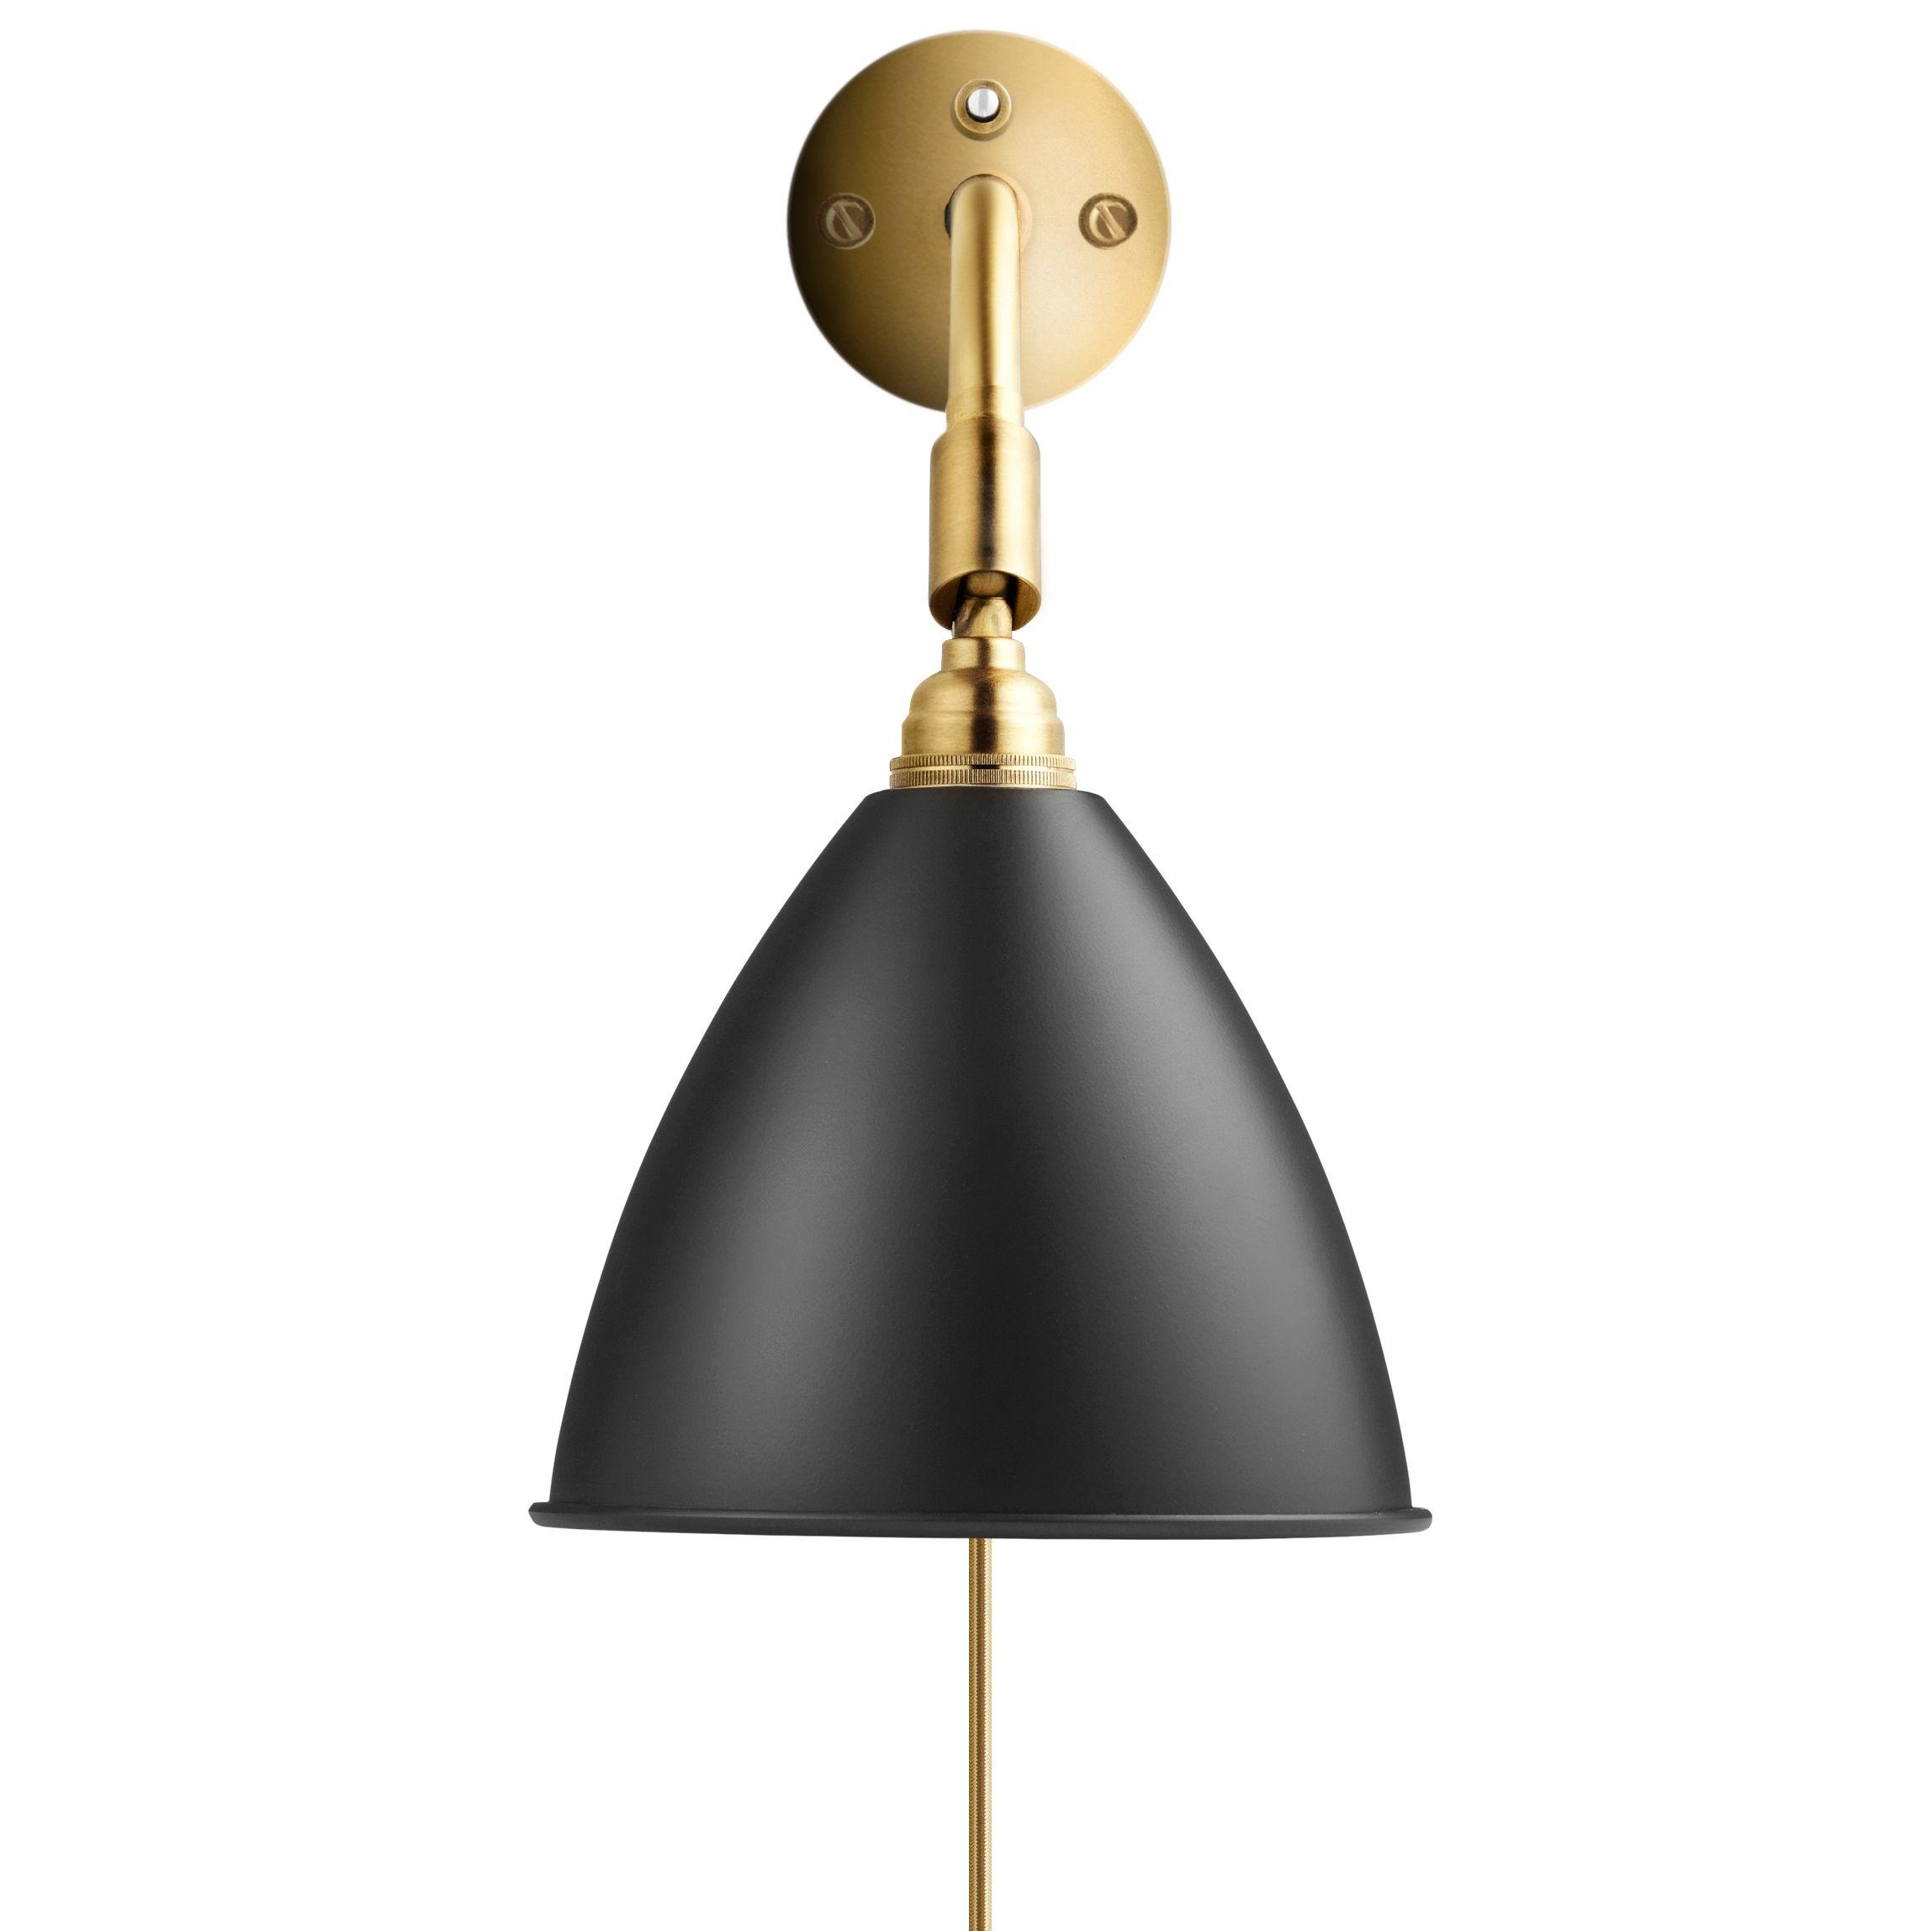 Gubi Bestlite BL7 wandlamp zwart/messing met stekker